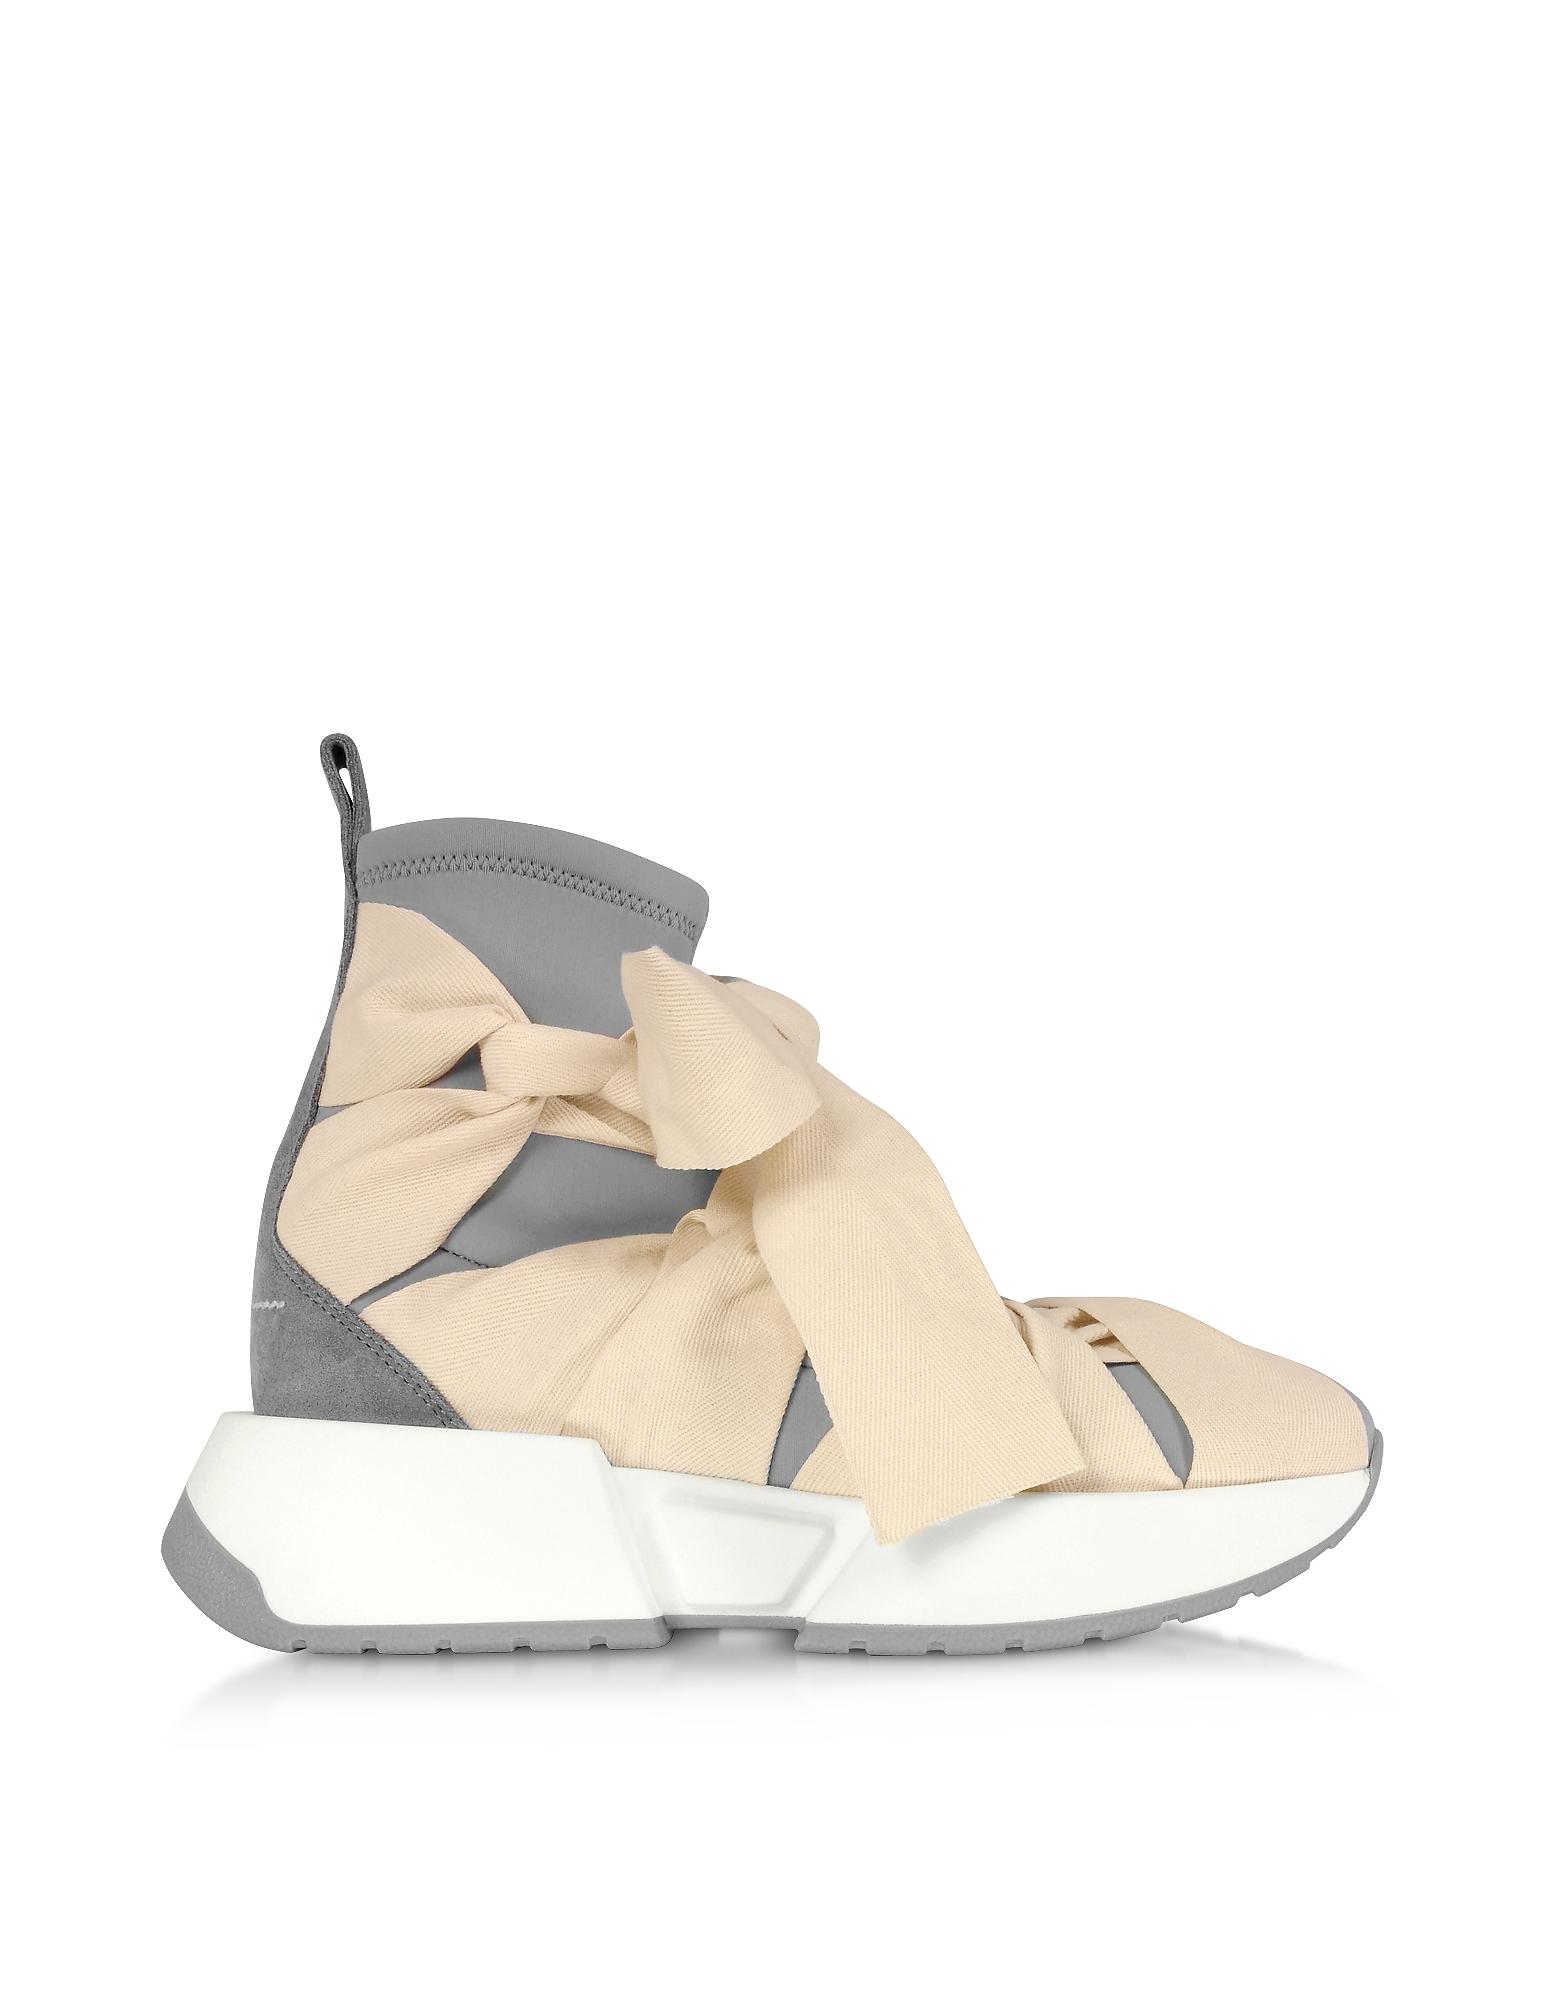 MM6 Maison Martin Margiela Designer Shoes, Ribbon Tied Socks Sneakers